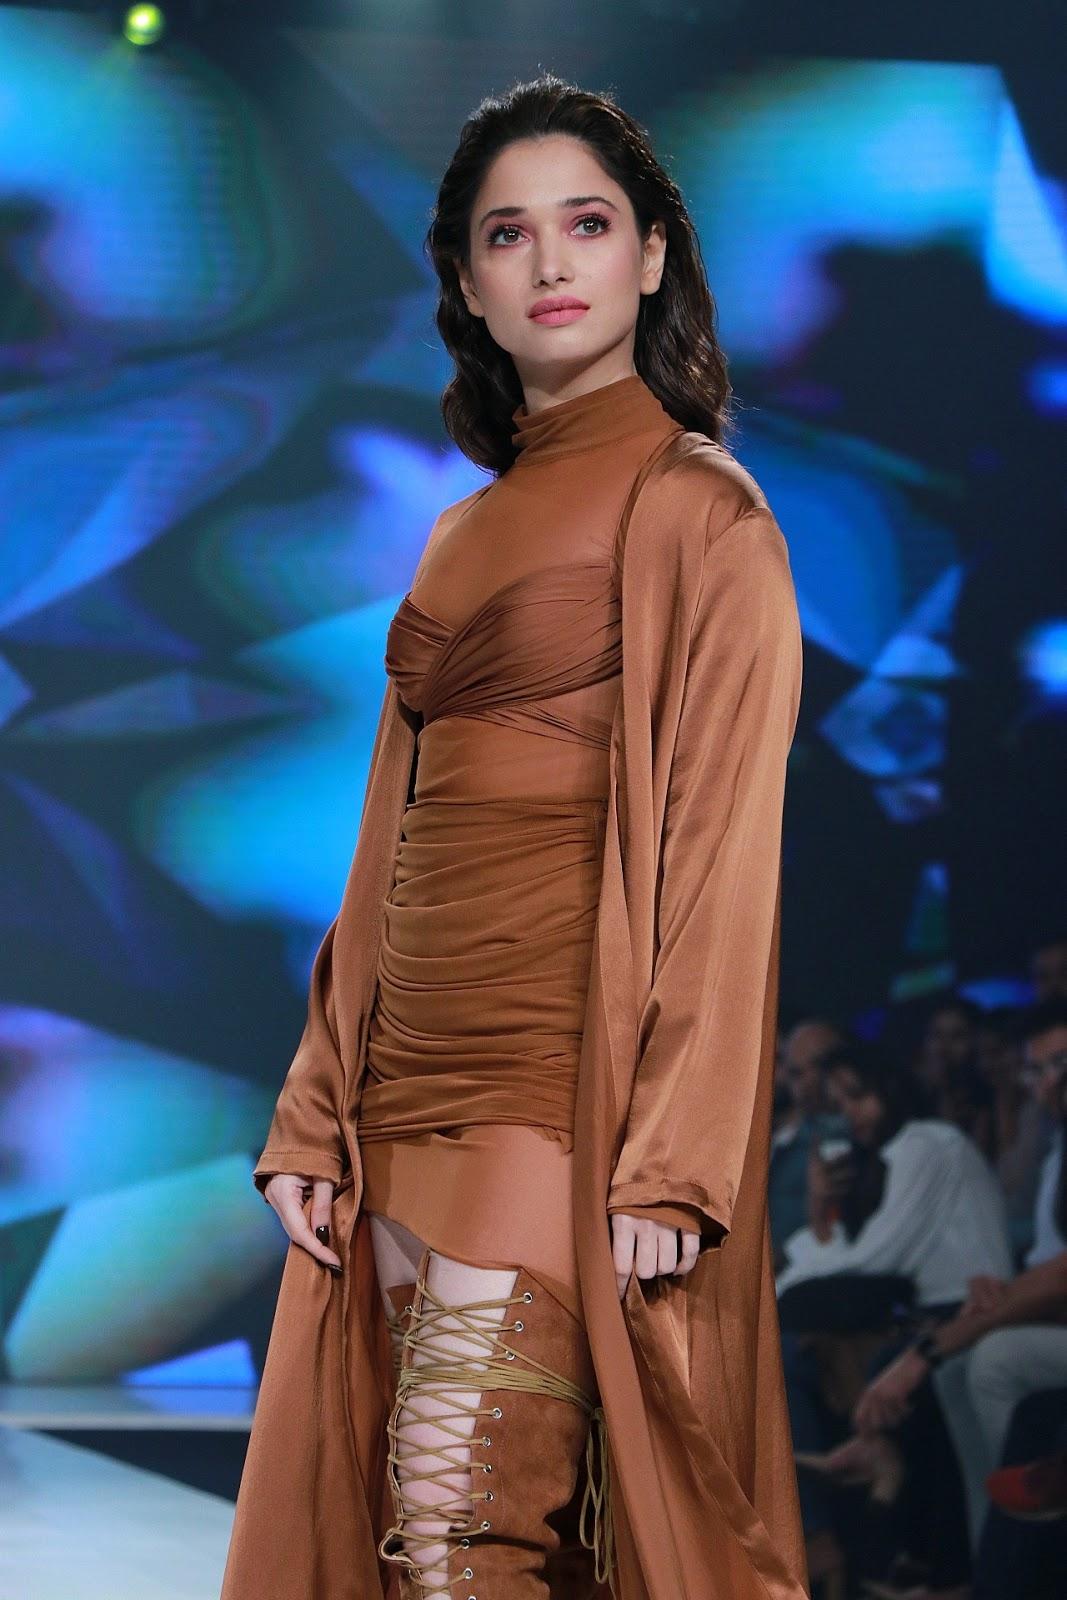 Tamanna Bhatia Ramp Walk At Bombay Times Fashion Week 2020